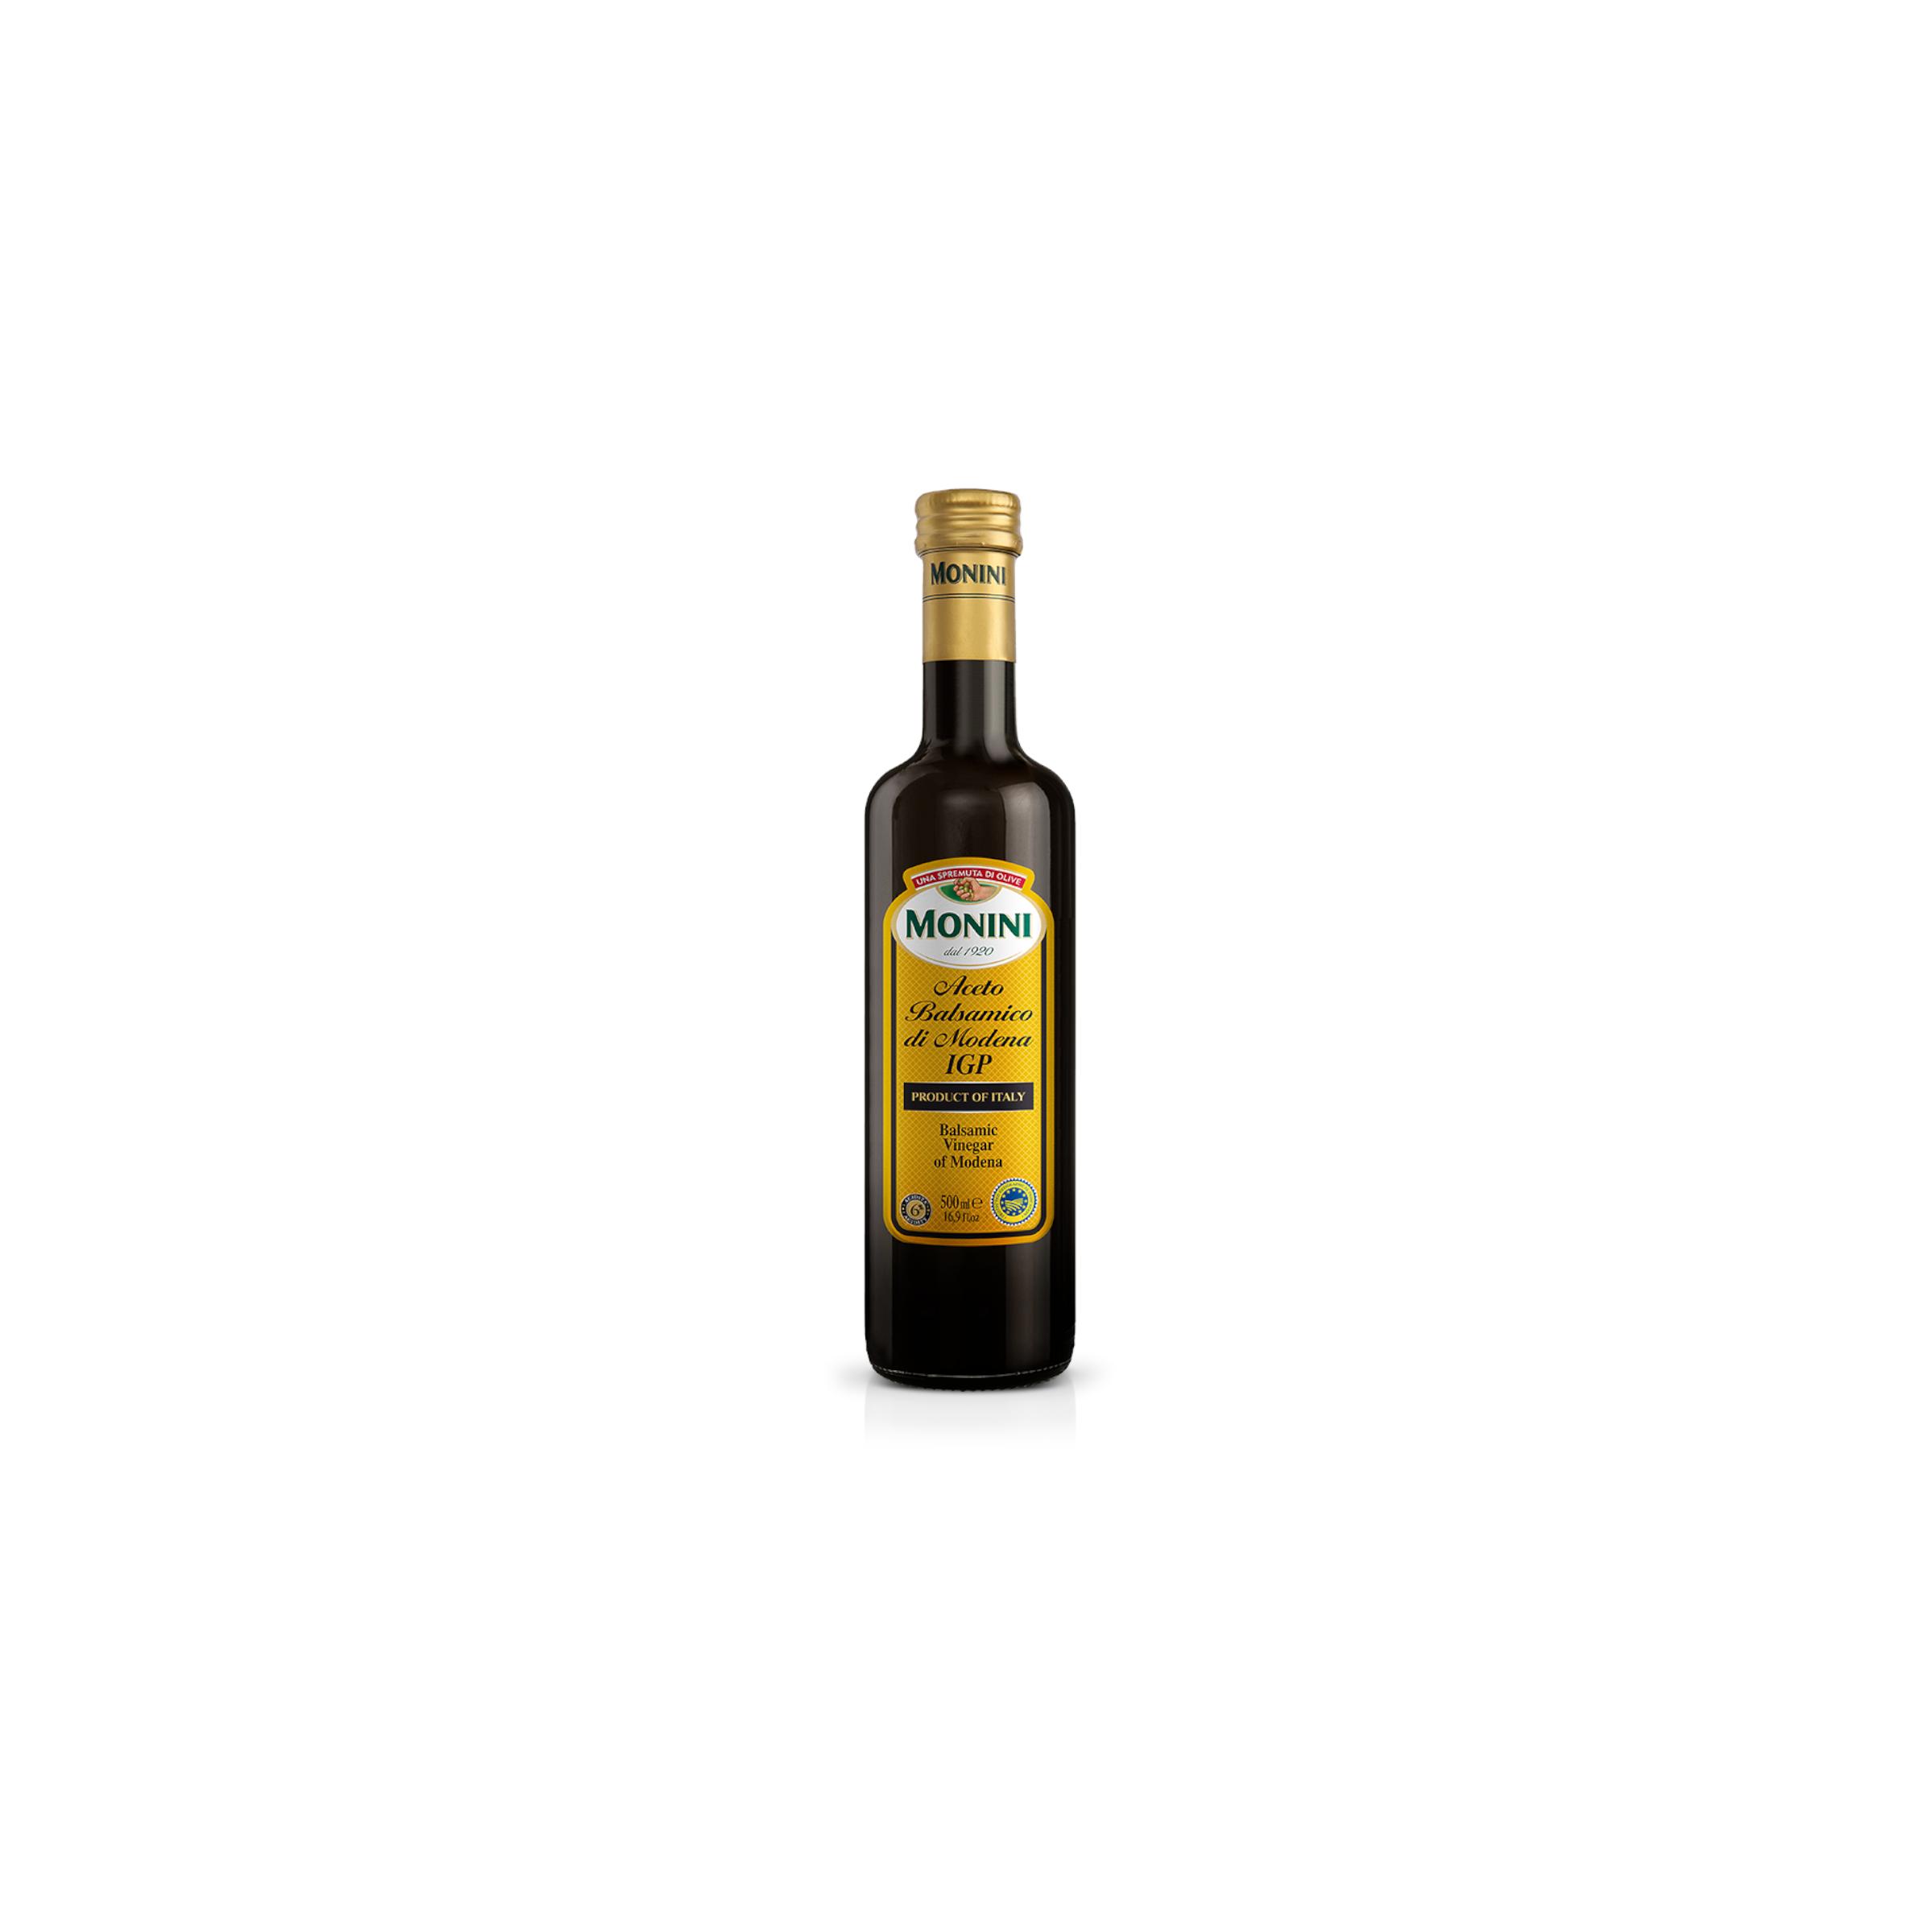 Mo_Main_Aceto-Balsamico-500-ml-POLONIA_474_990px